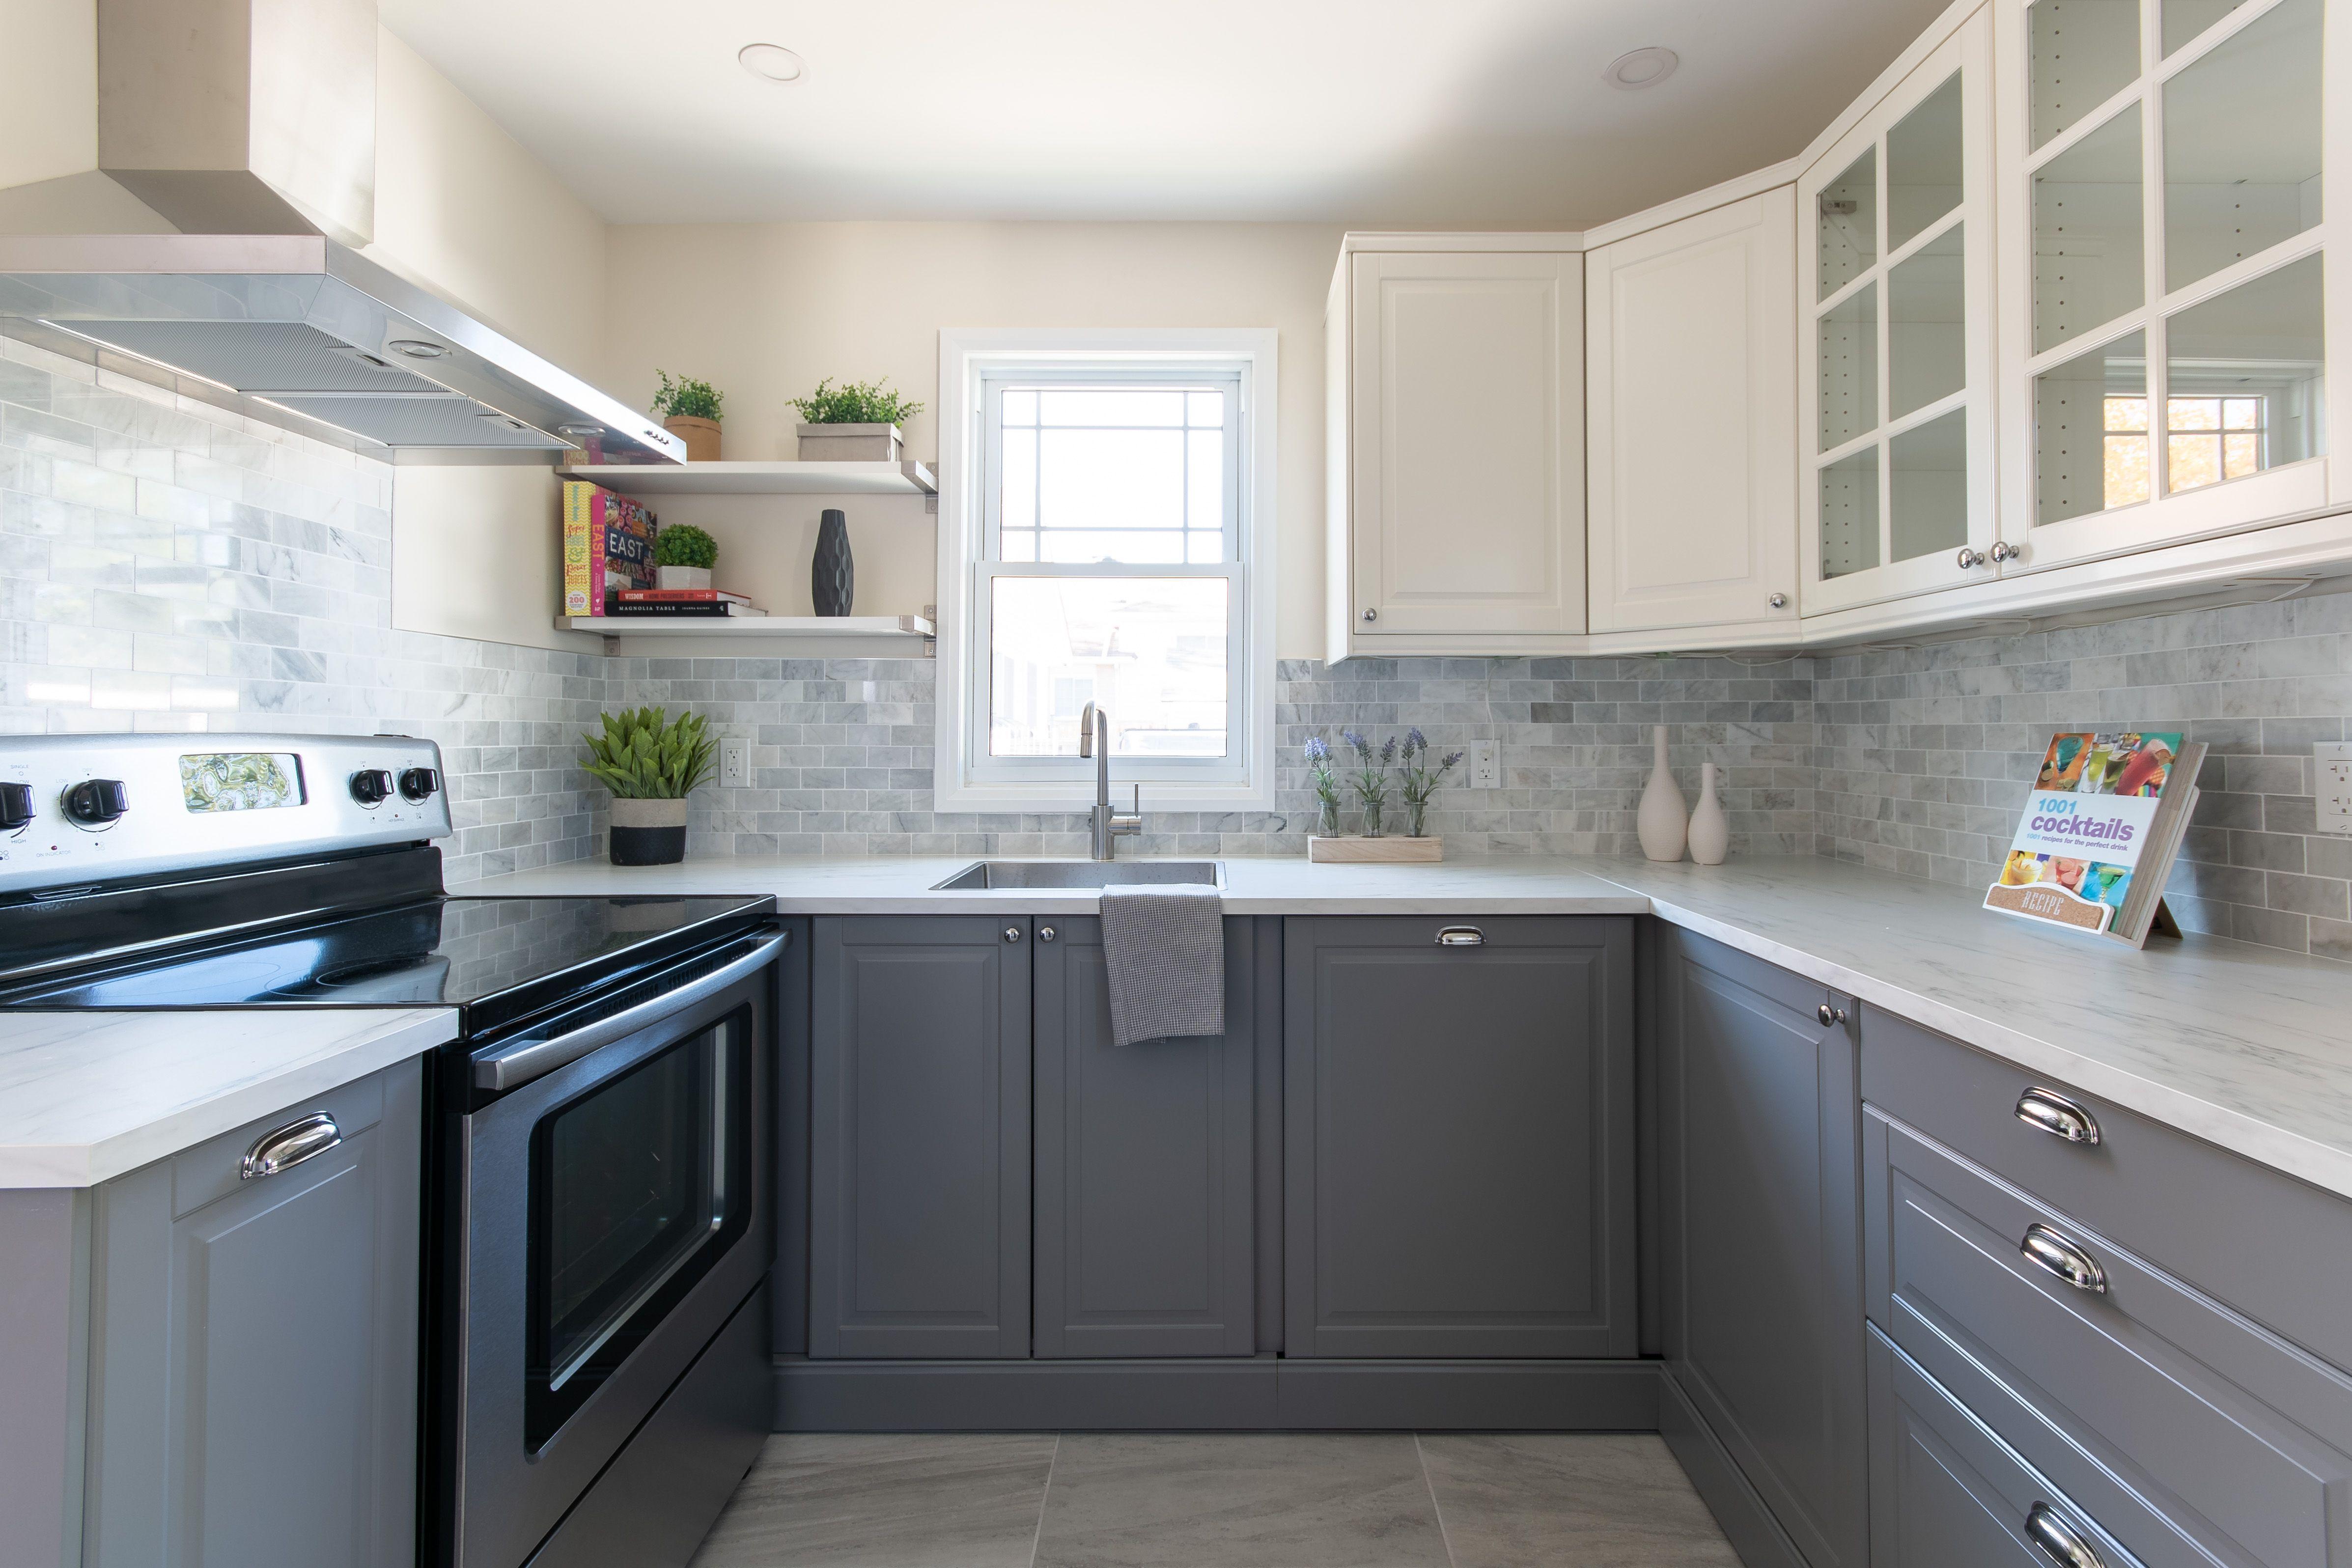 Architecture Painting Kitchen Cabinets Back Splashes Remodels And Restorations Kitchen Countertops Kit Em 2020 Designs De Cozinha Cozinhas Modernas Ideias Para Cozinha